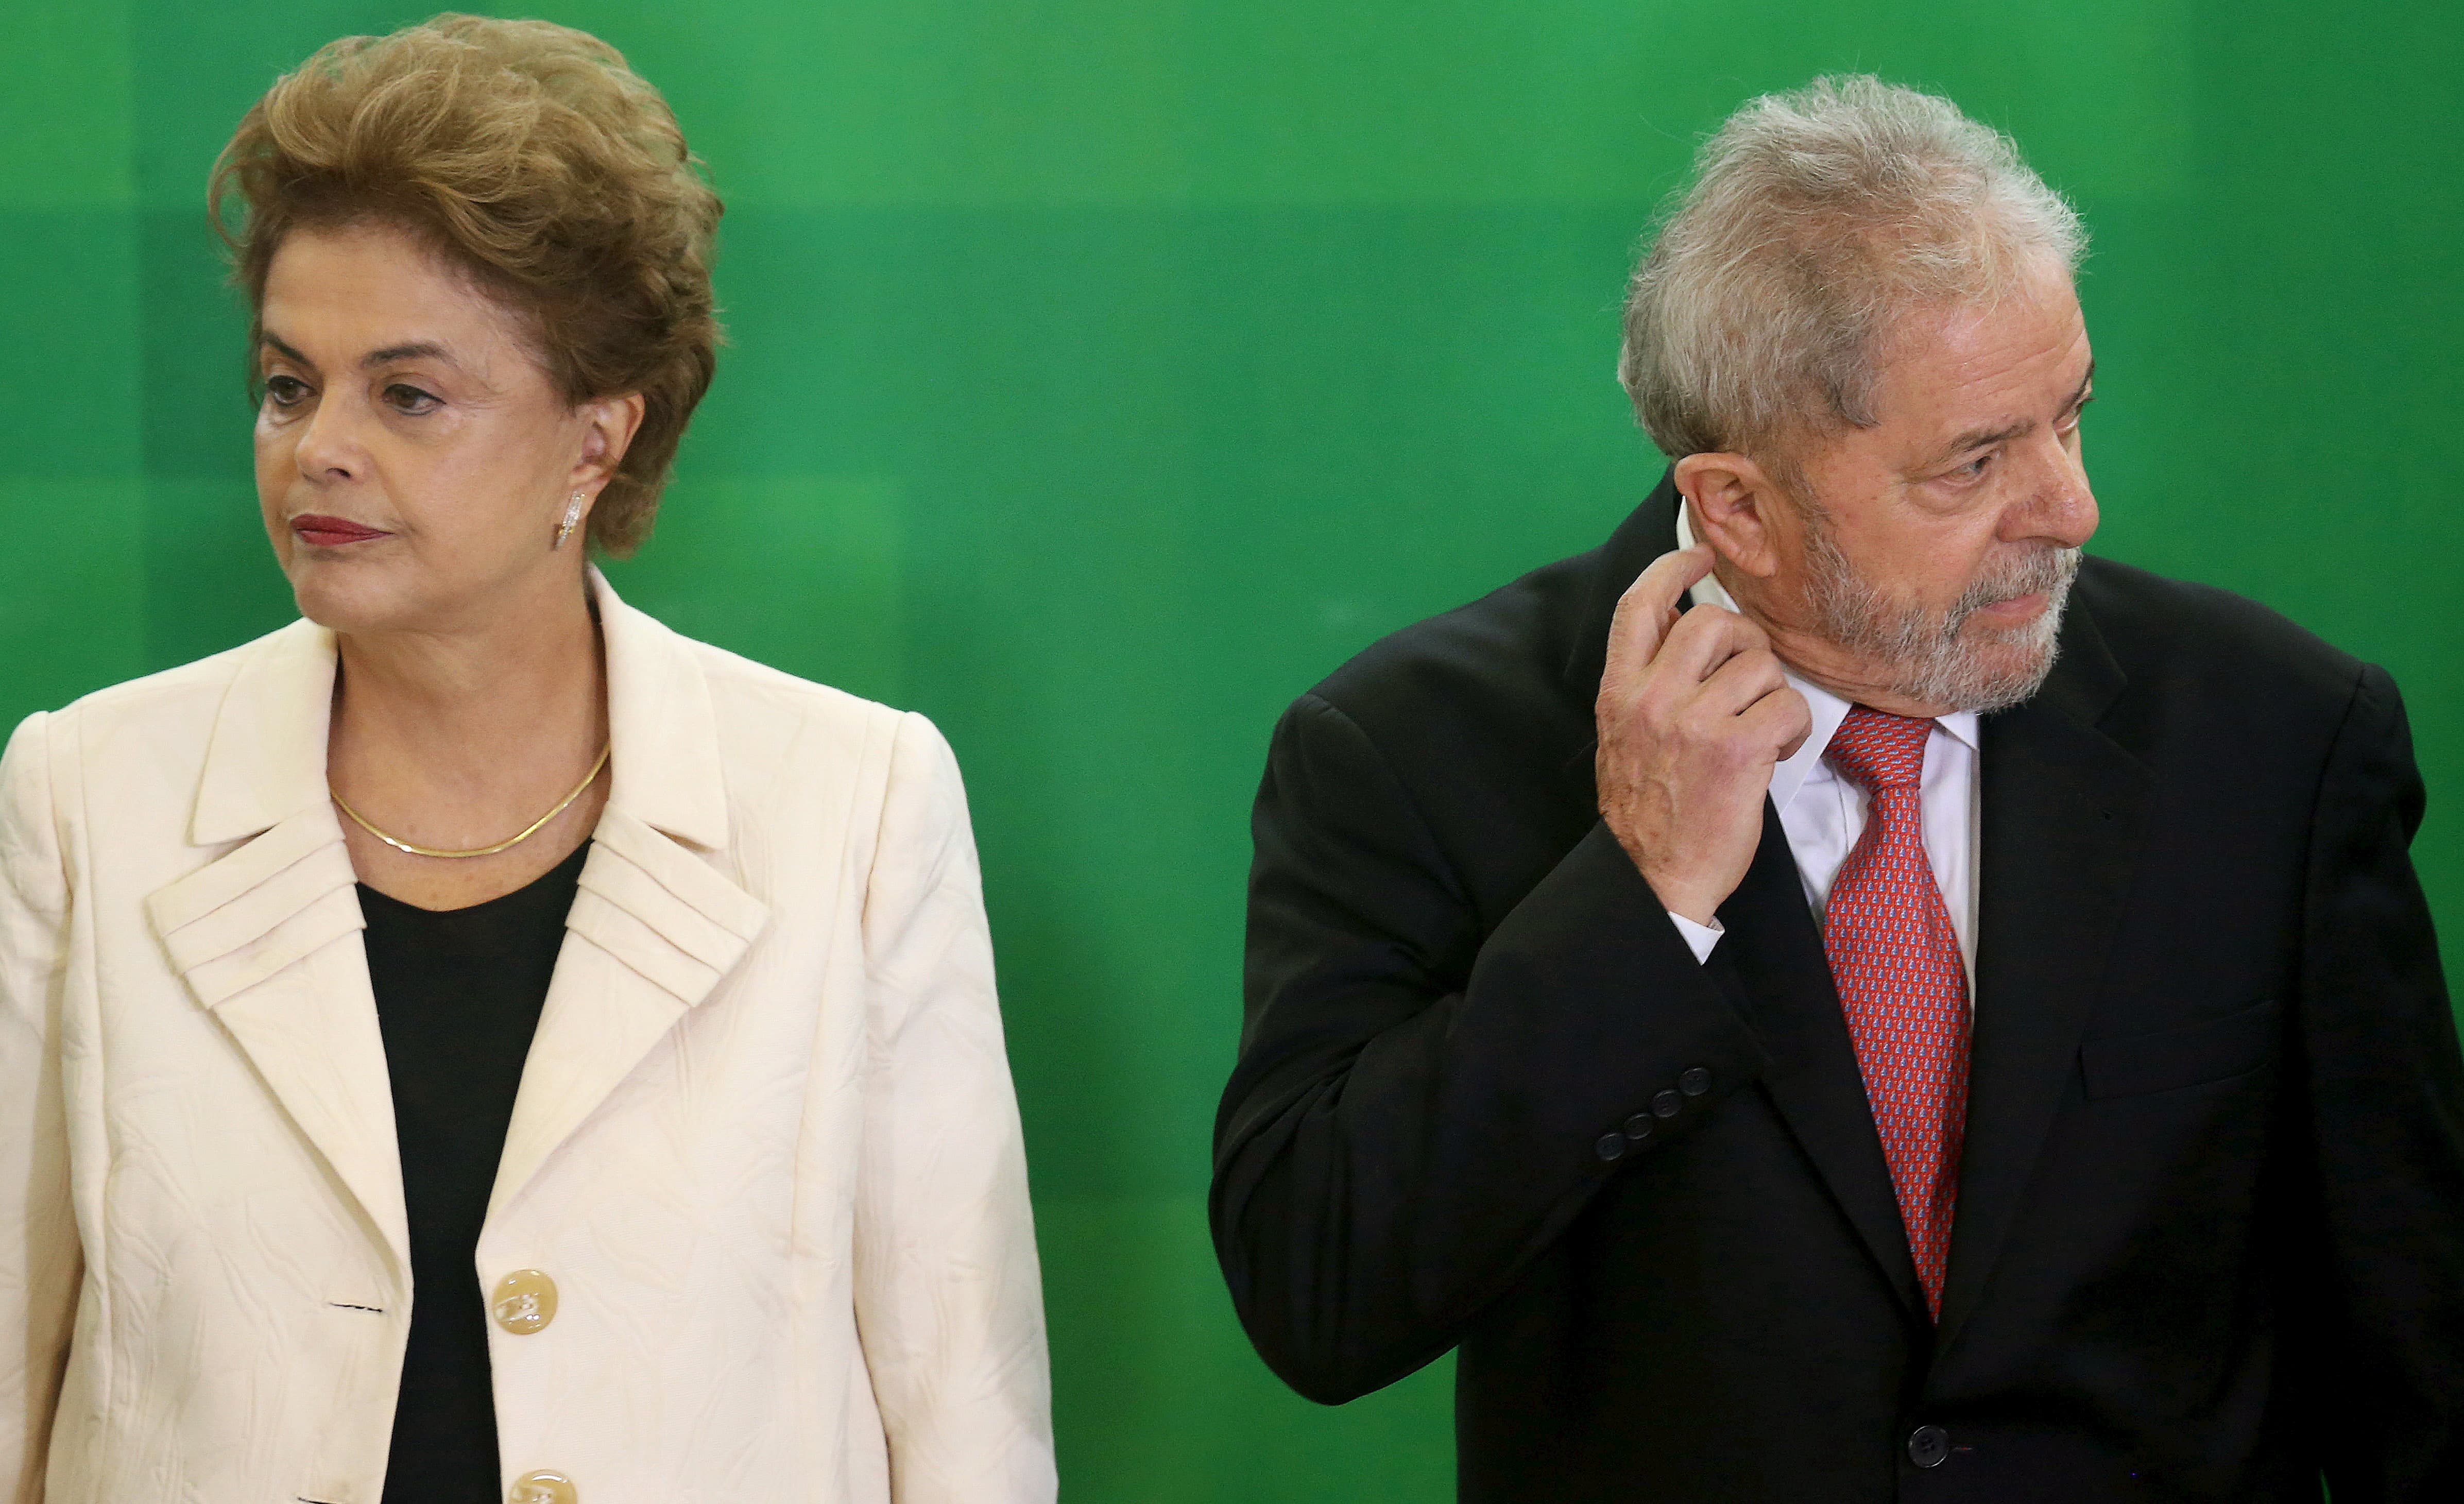 Gli ex presidenti brasiliani Dilma Rousseff e Luiz Inacio Lula da Silva